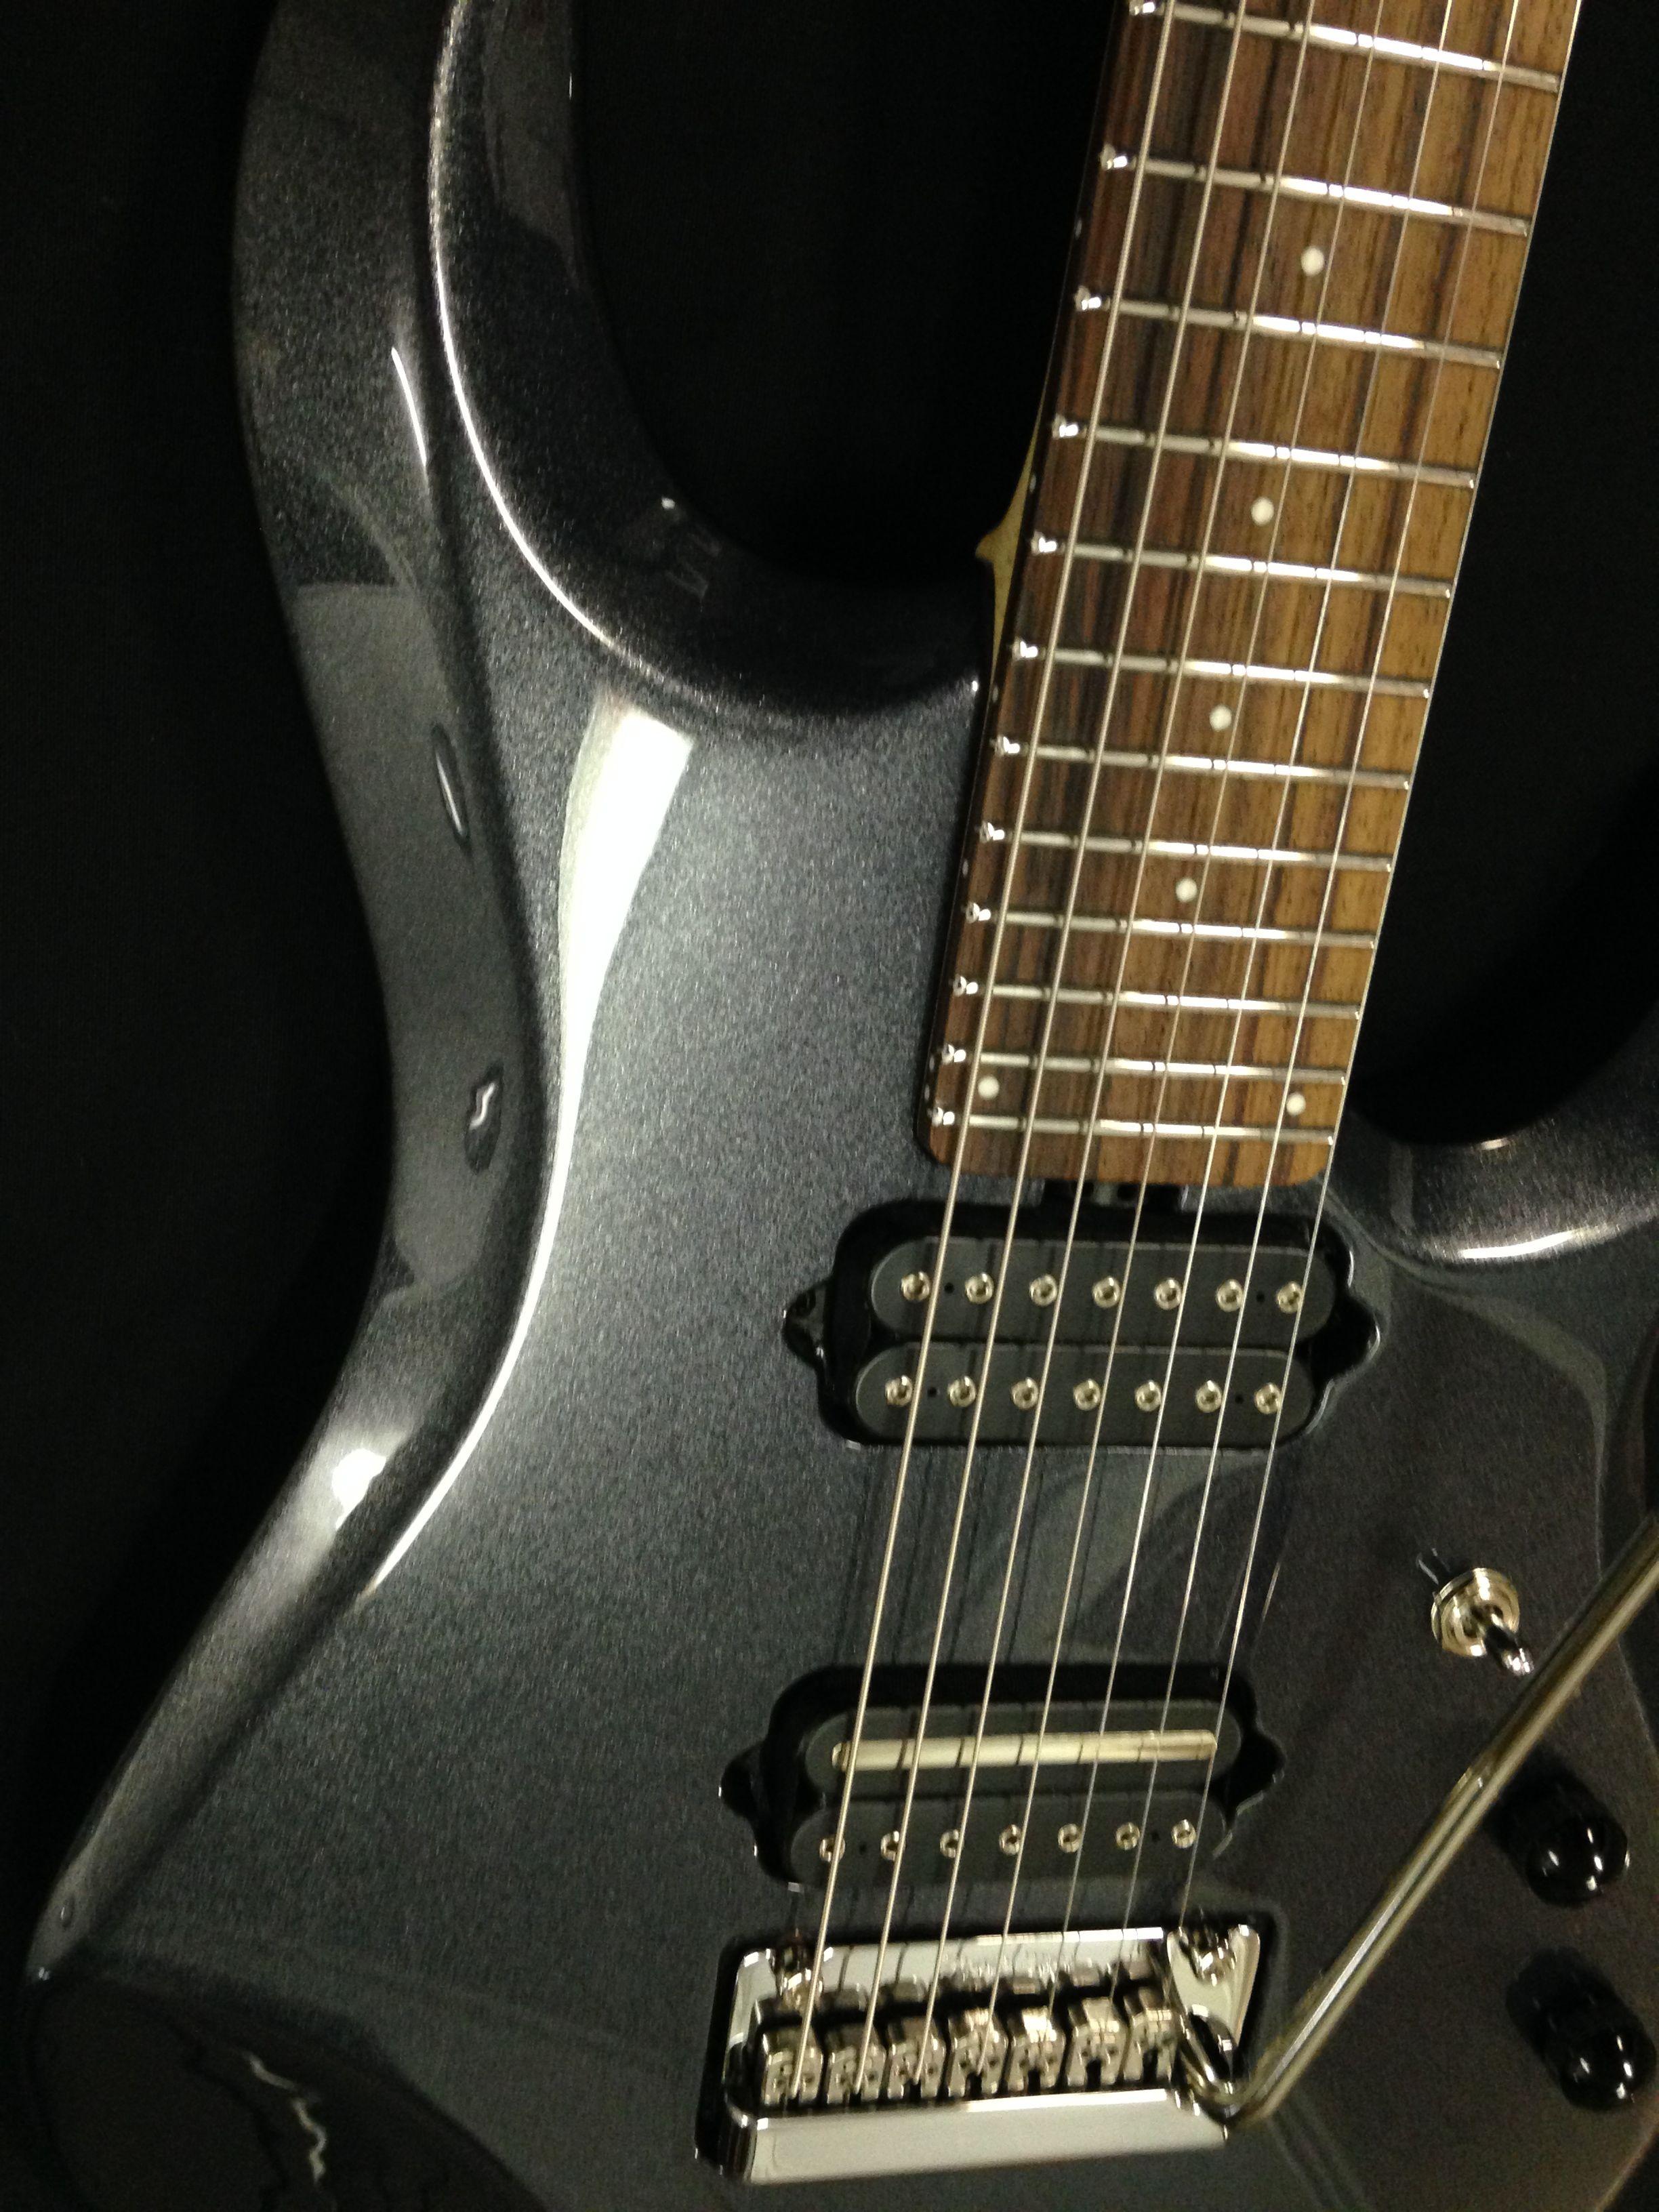 The sleek Music Man JP7 in Sapphire black | Guitar - Music Man ...